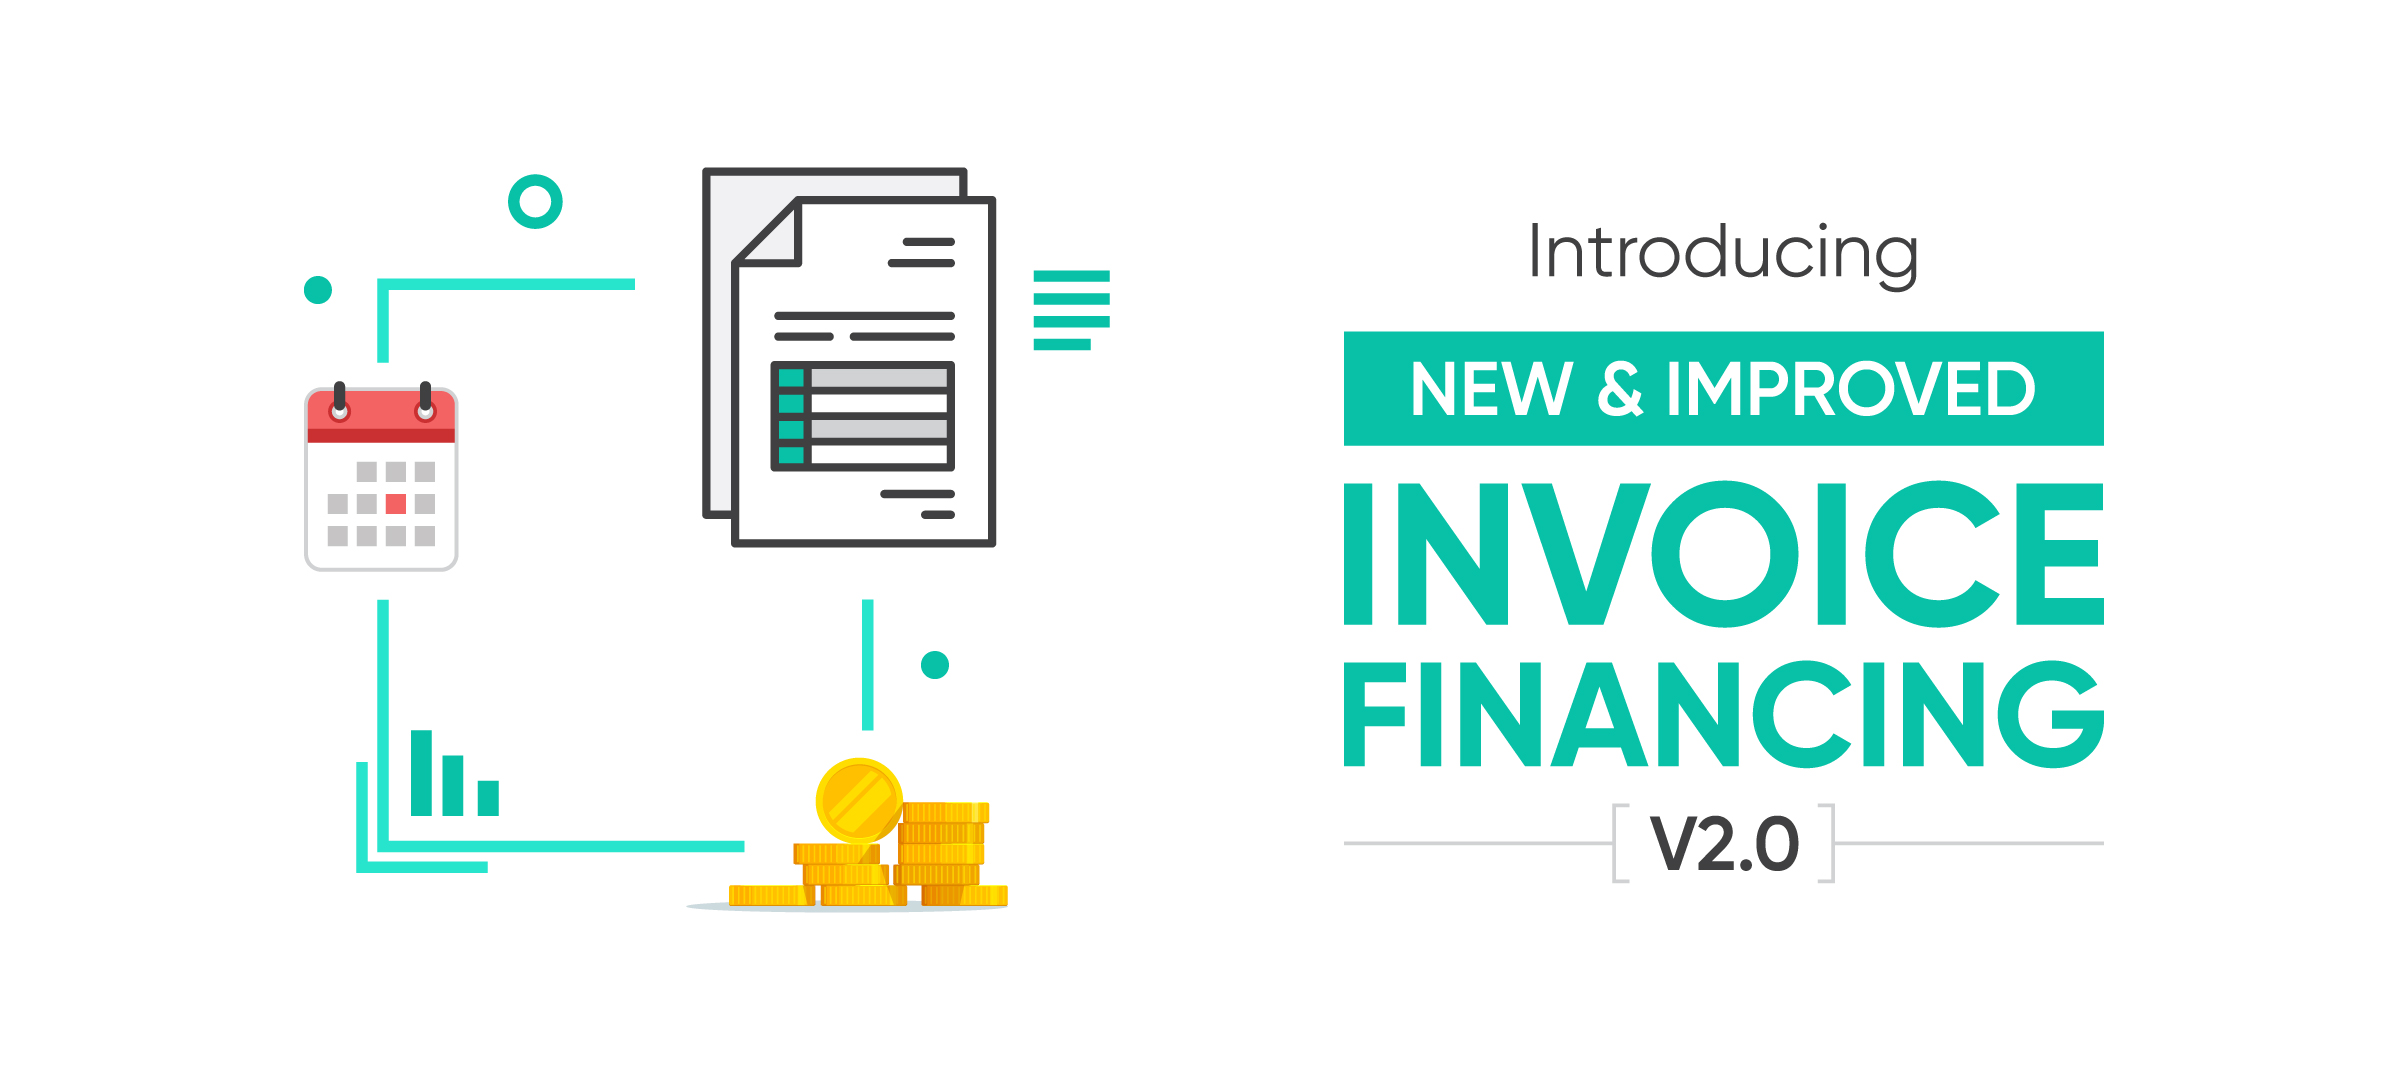 Funding Societies New & Improved Invoice Financing V2.0